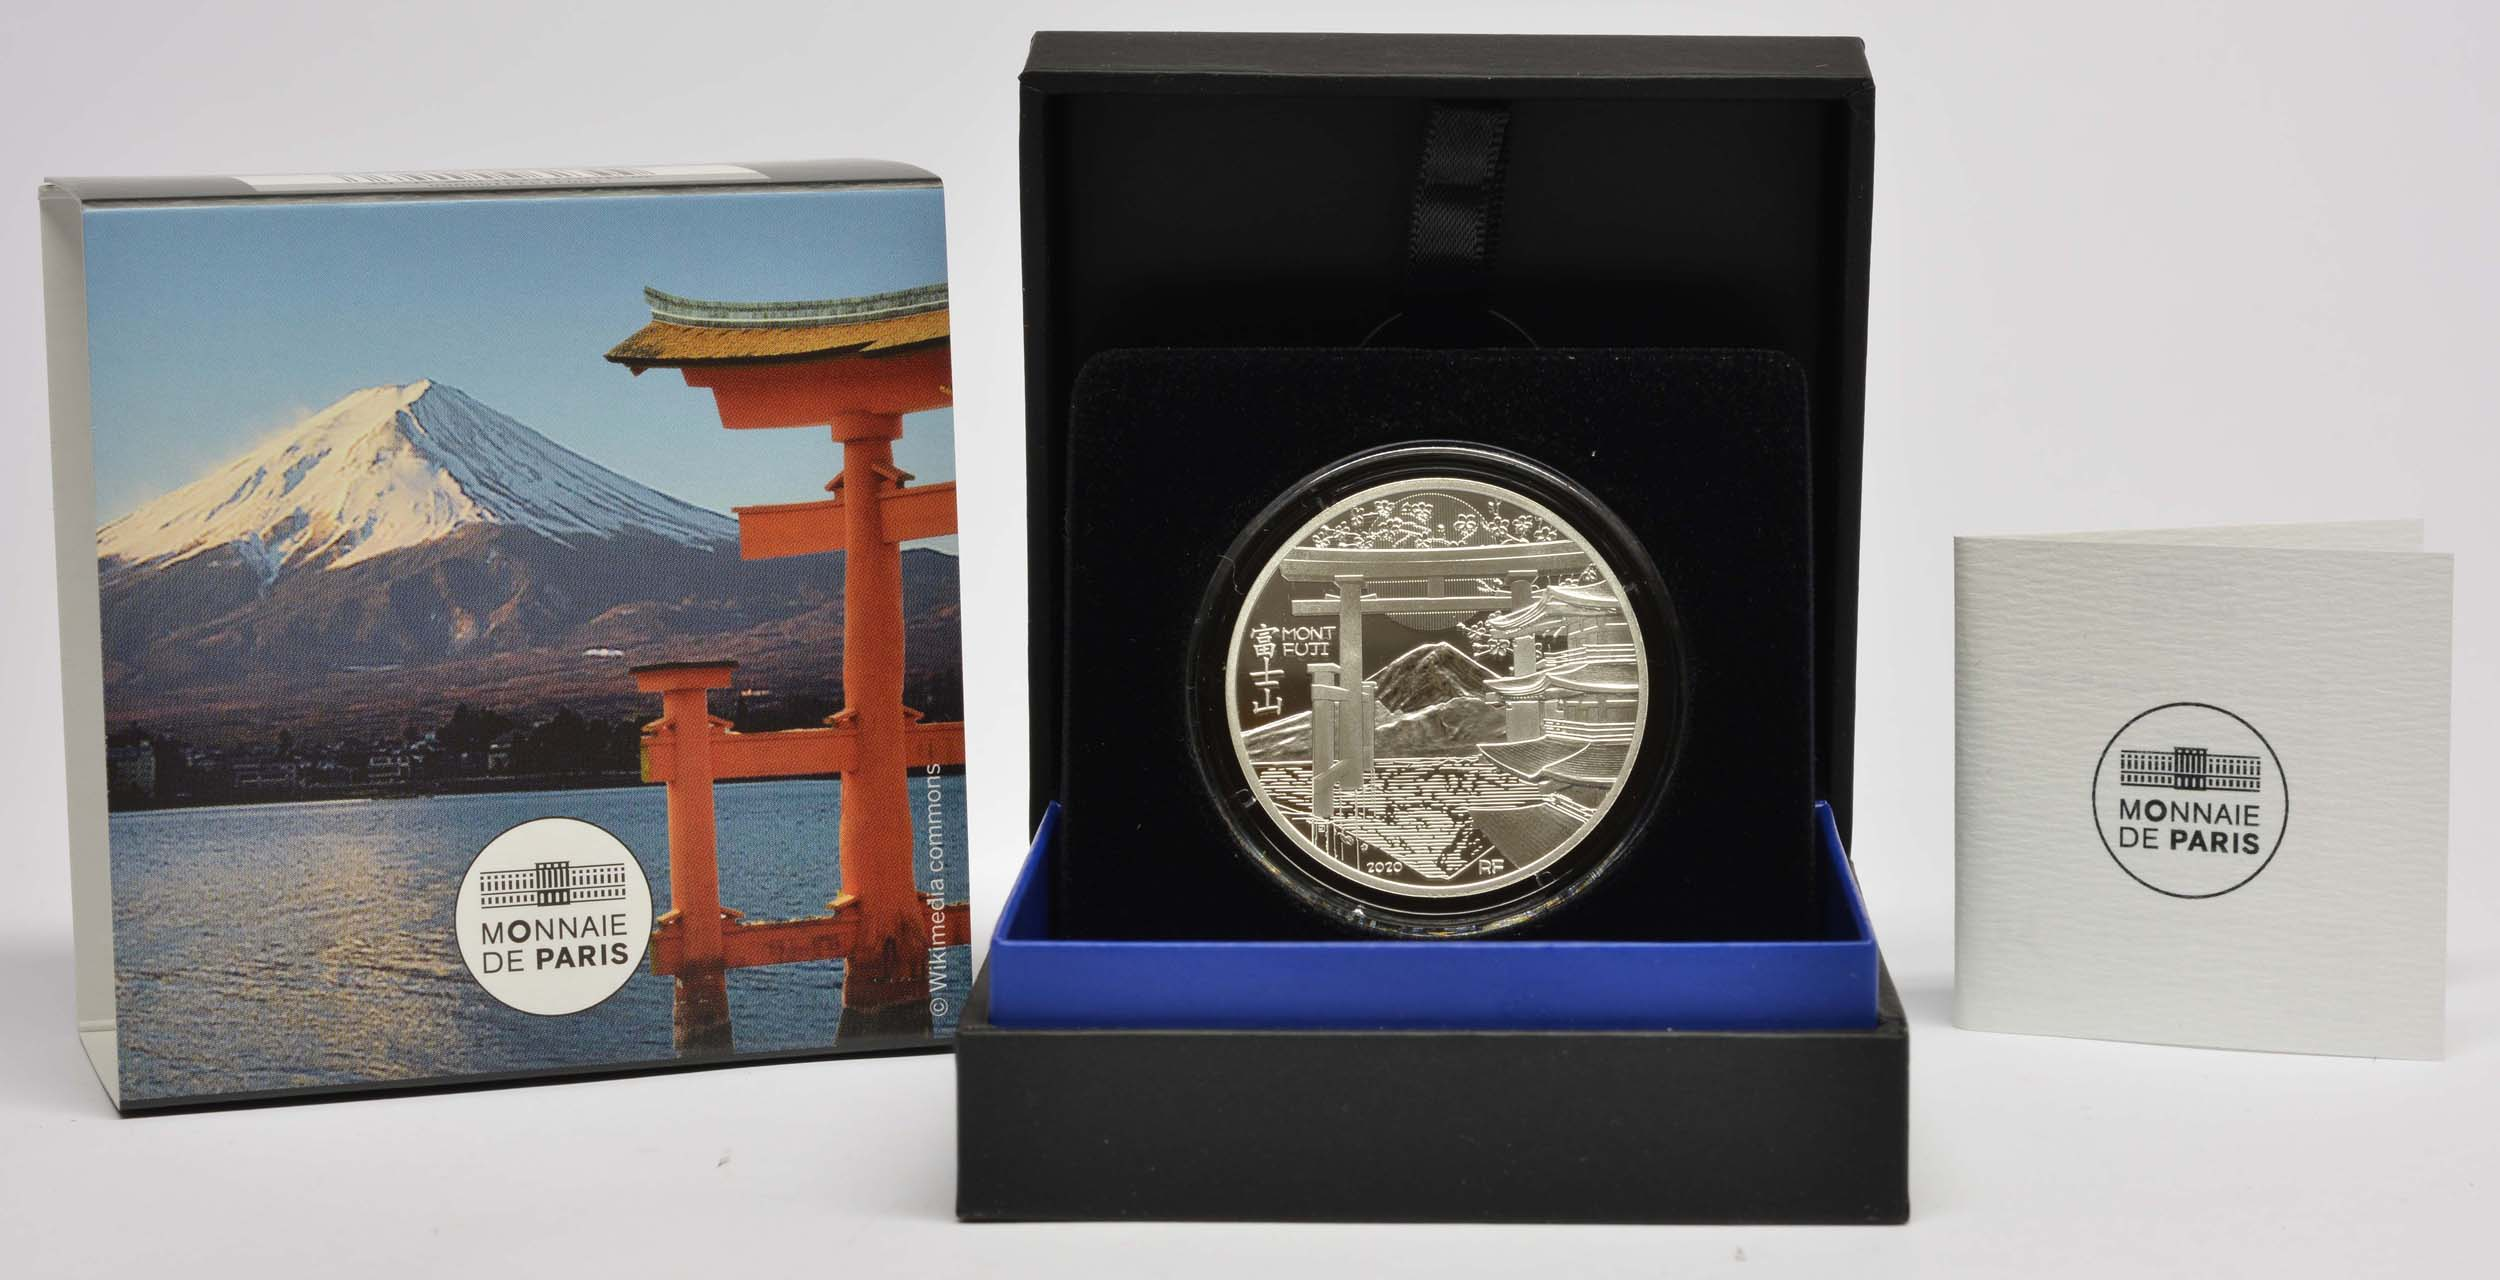 Lieferumfang:Frankreich : 10 Euro Die Drei Berge - Mt. Fuji  2020 PP